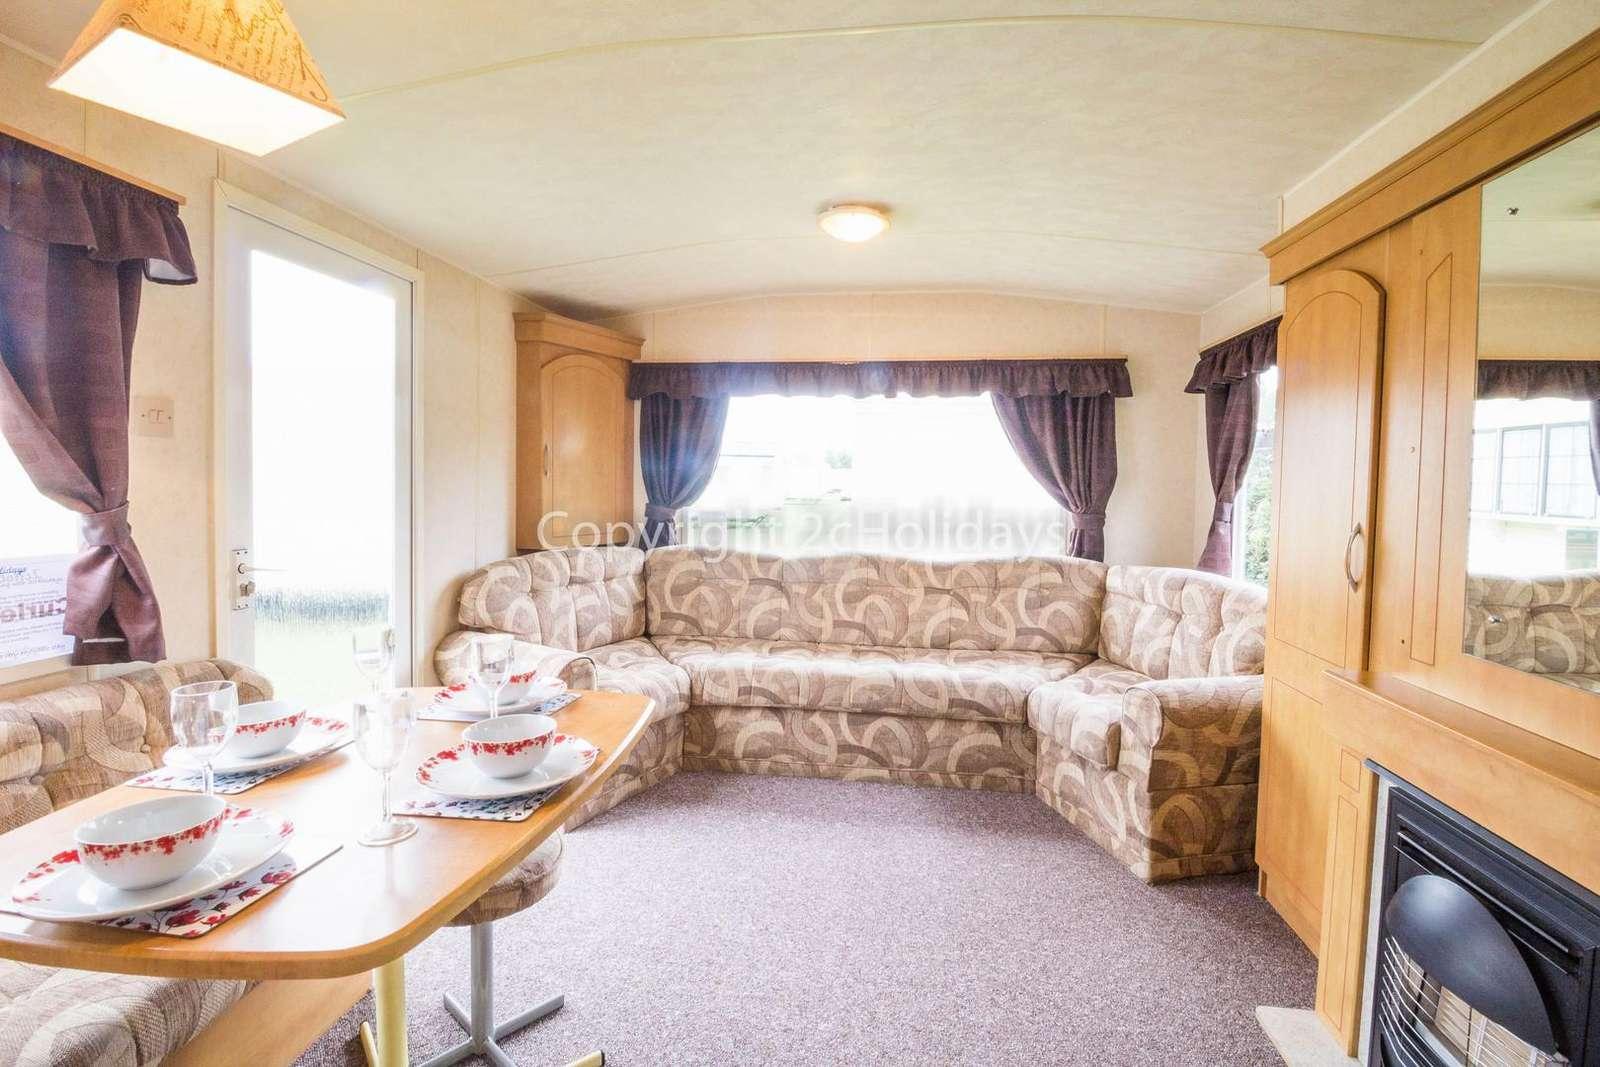 Caravan for hire in Scratby, Norfolk